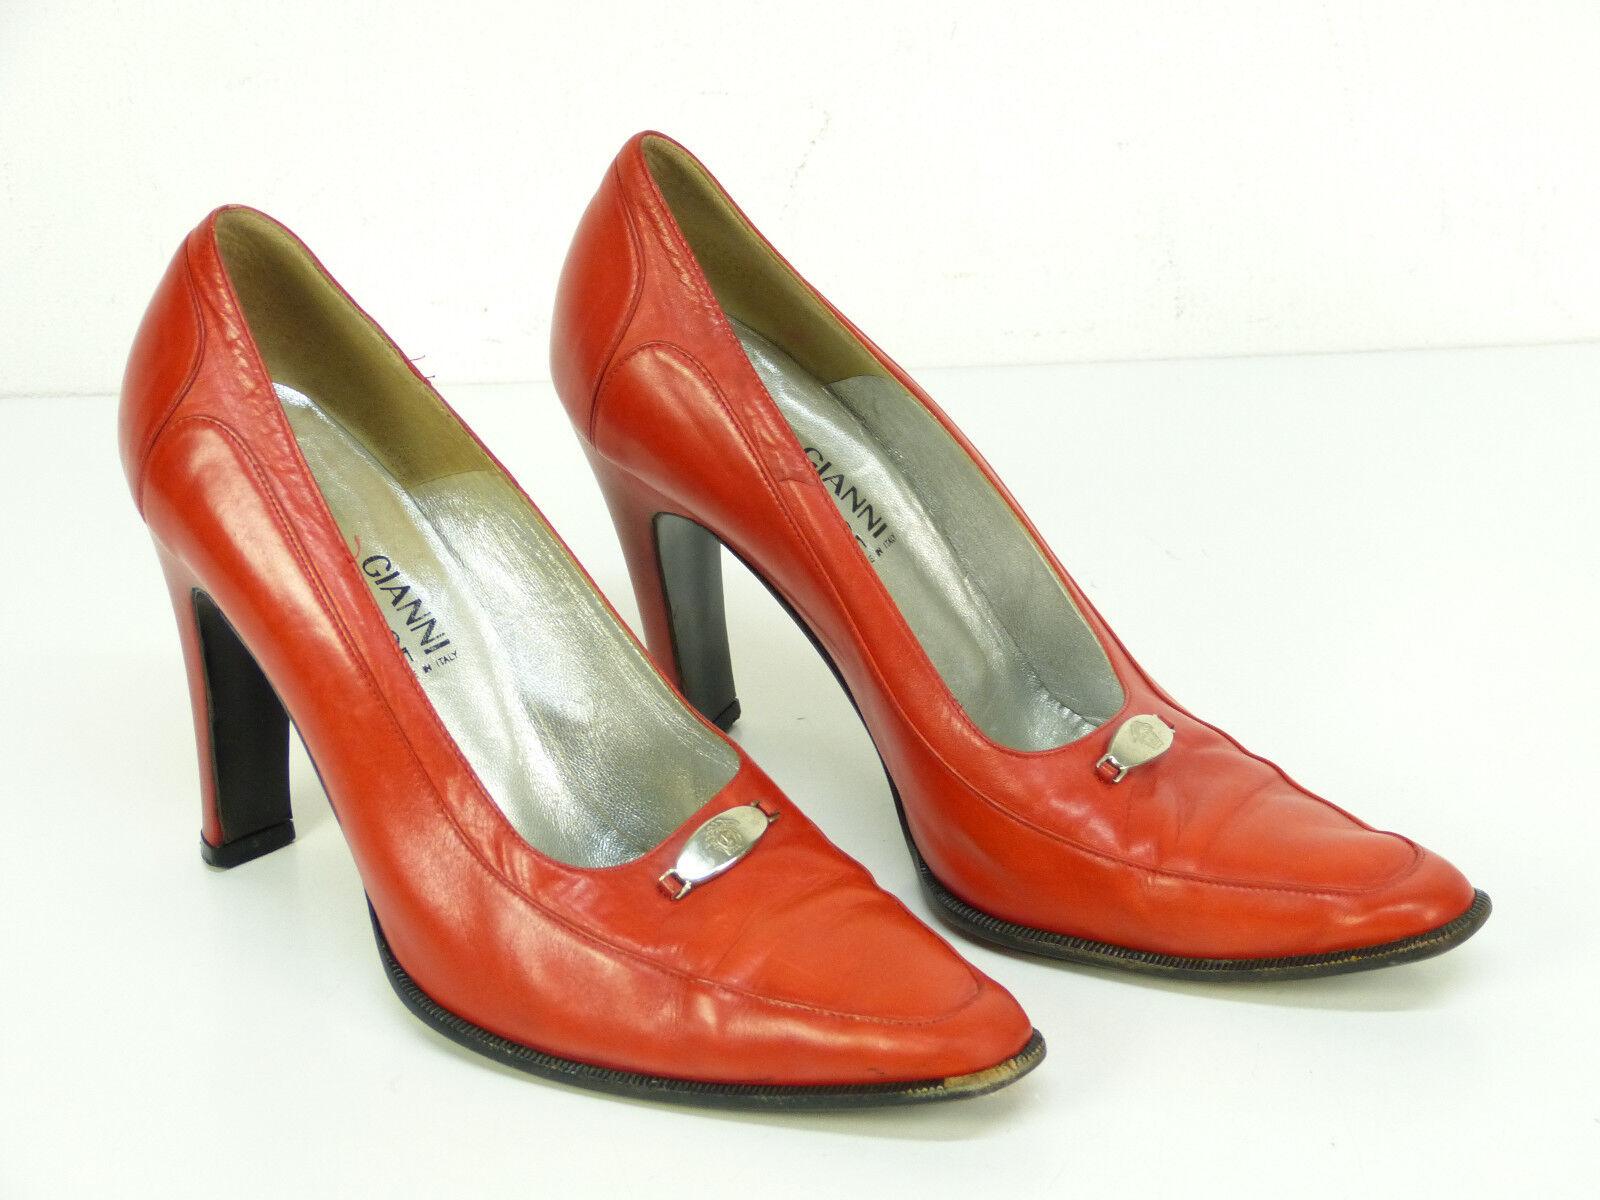 Gianni VERSACE PELLE PUMPS puro taglia 37,5/Rosso Argilla & puro PUMPS lusso-elegante (N 5382 R) 185dda